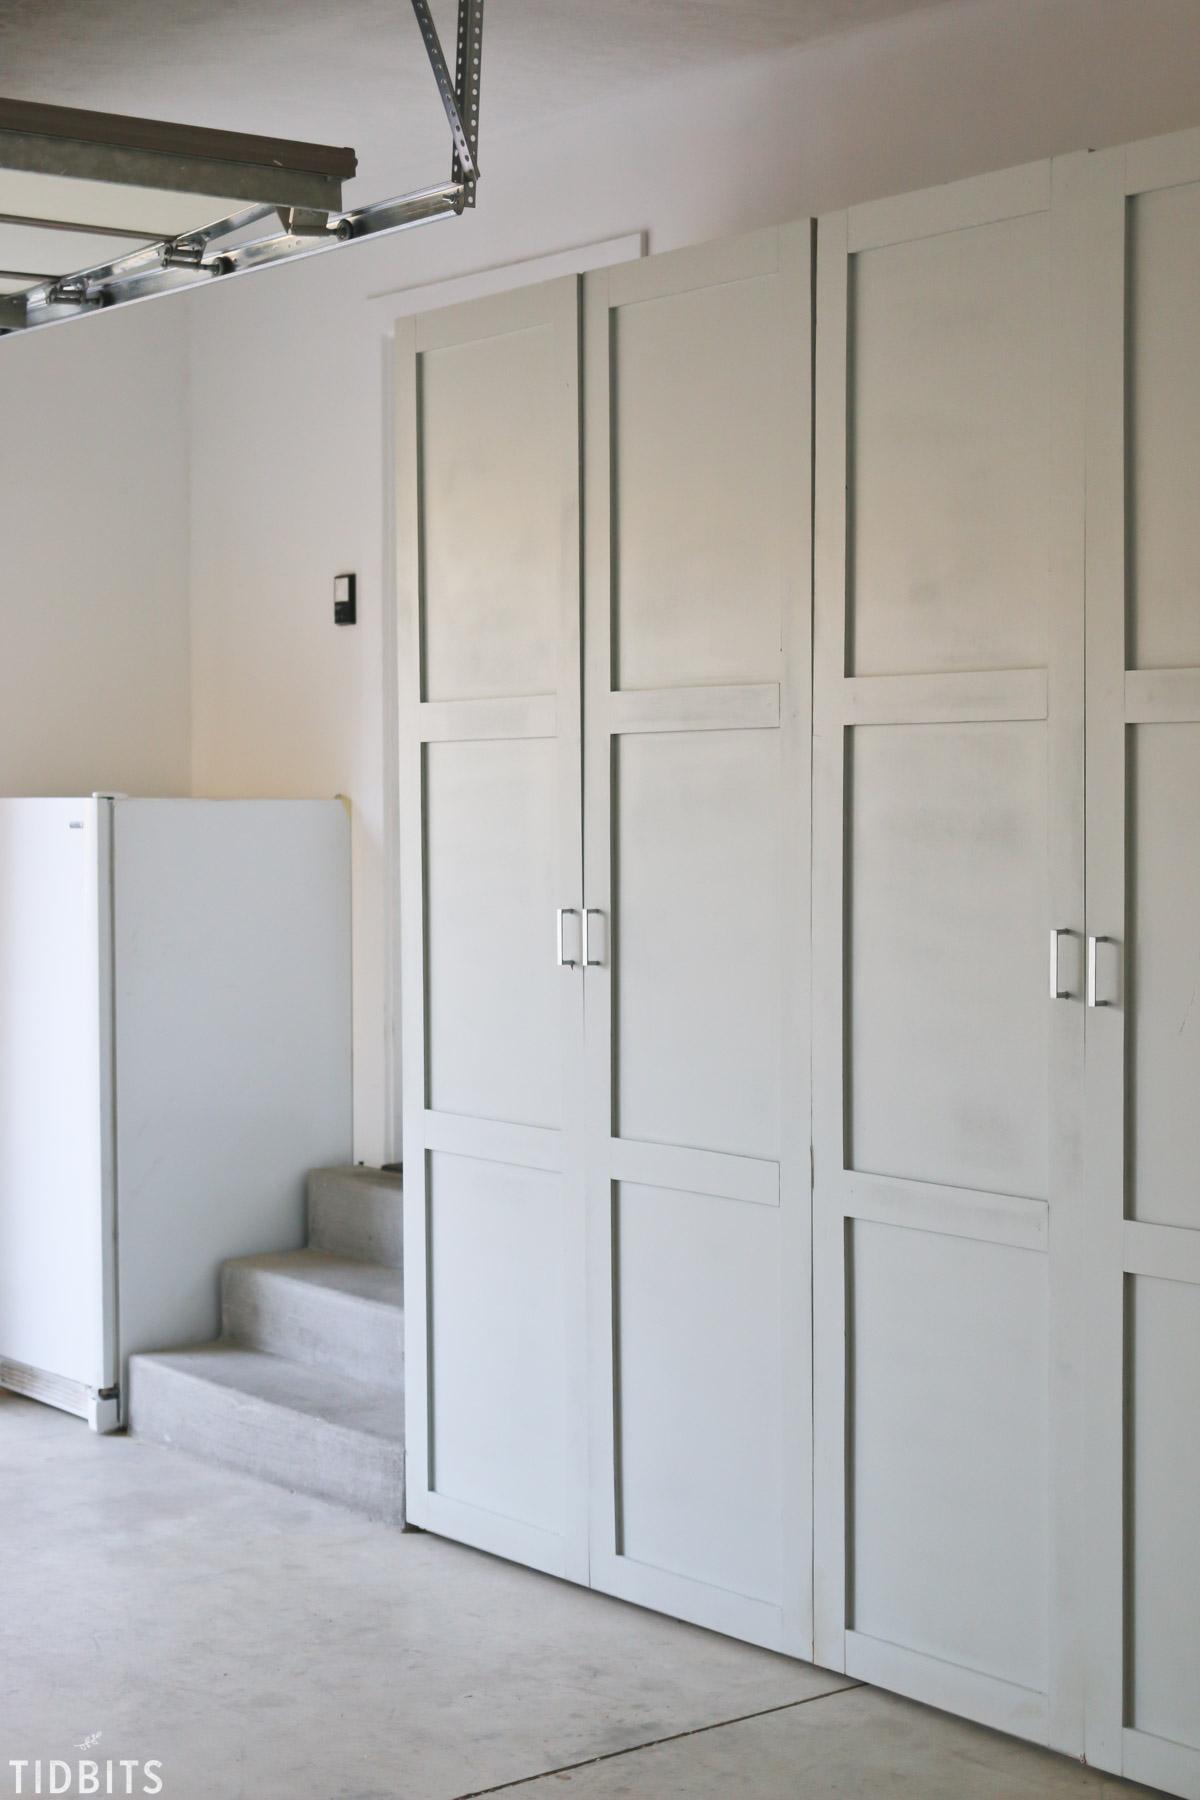 Garage Storage Cabinets  Free Building Plans  Tidbits